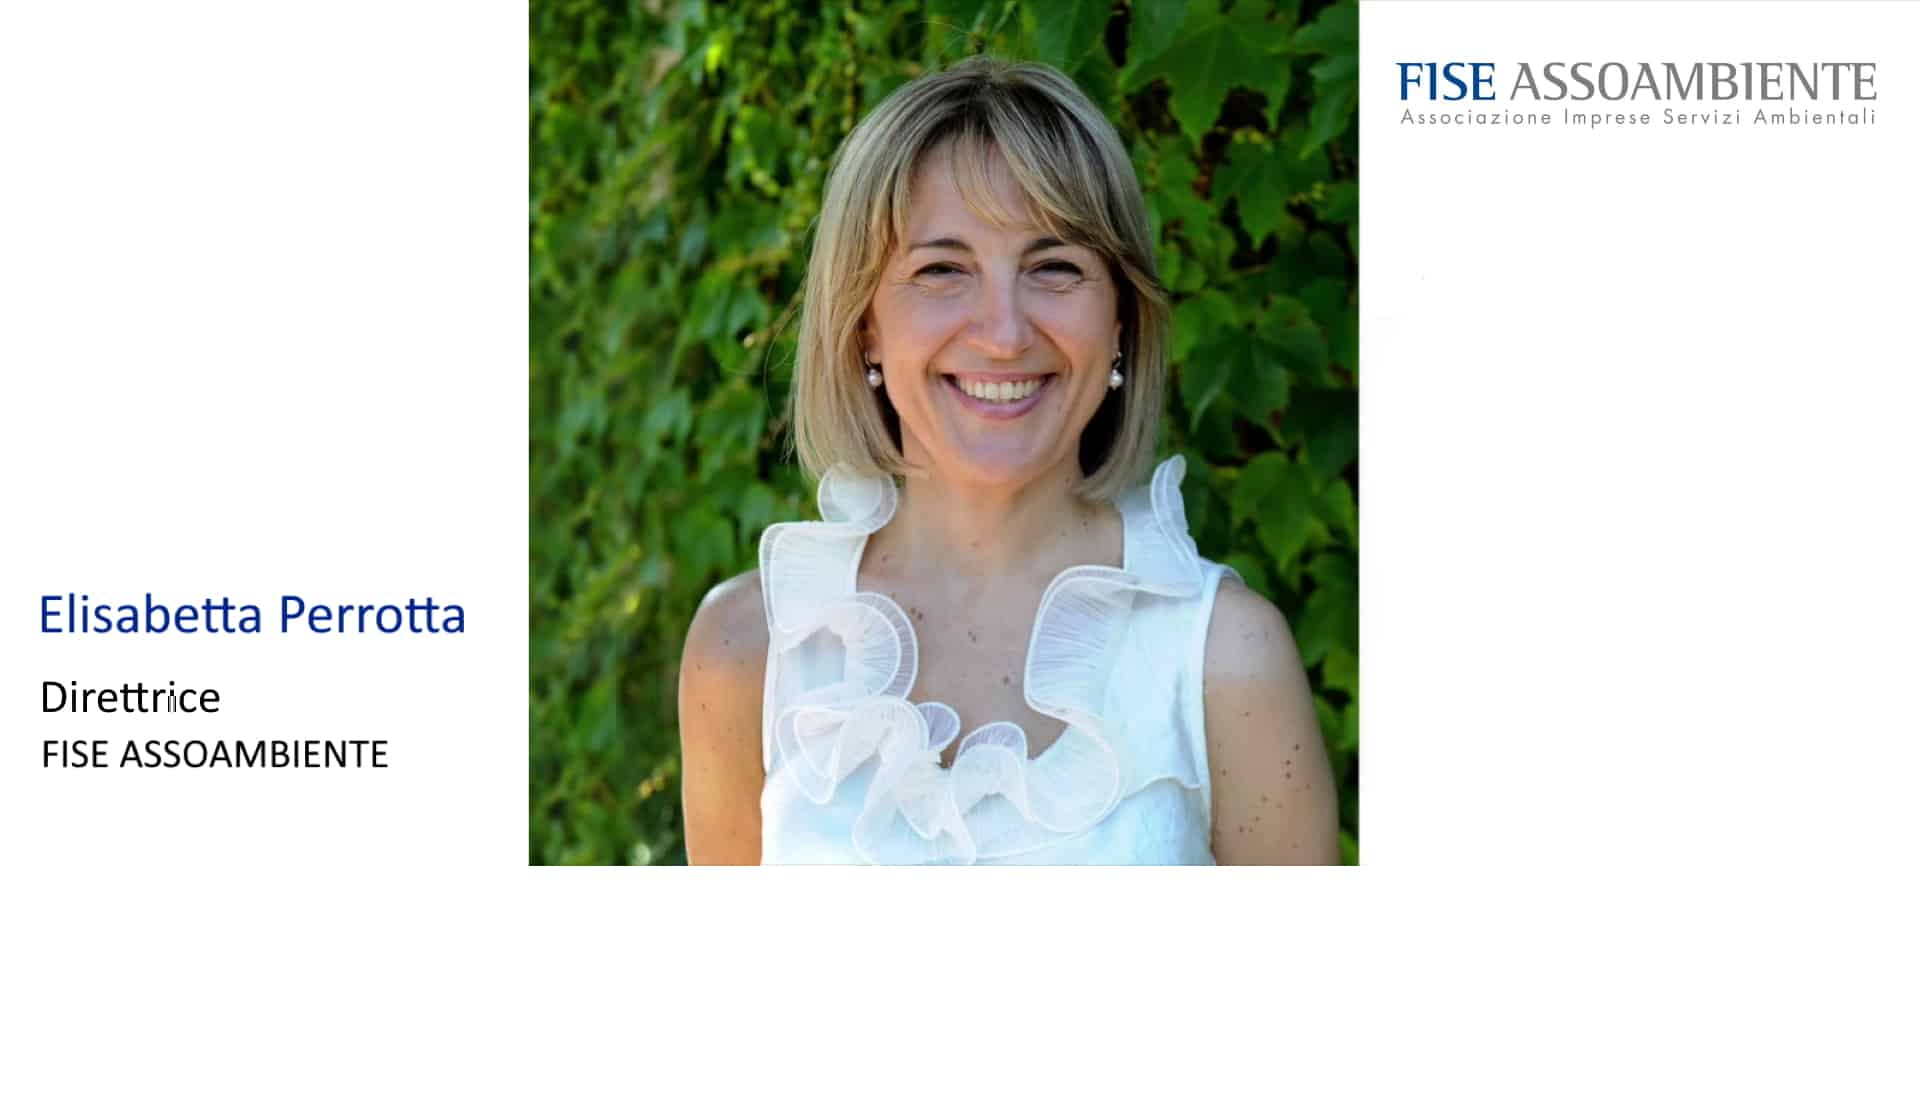 Elisabetta Perrotta: Direttrice FISE ASSOAMBIENTE